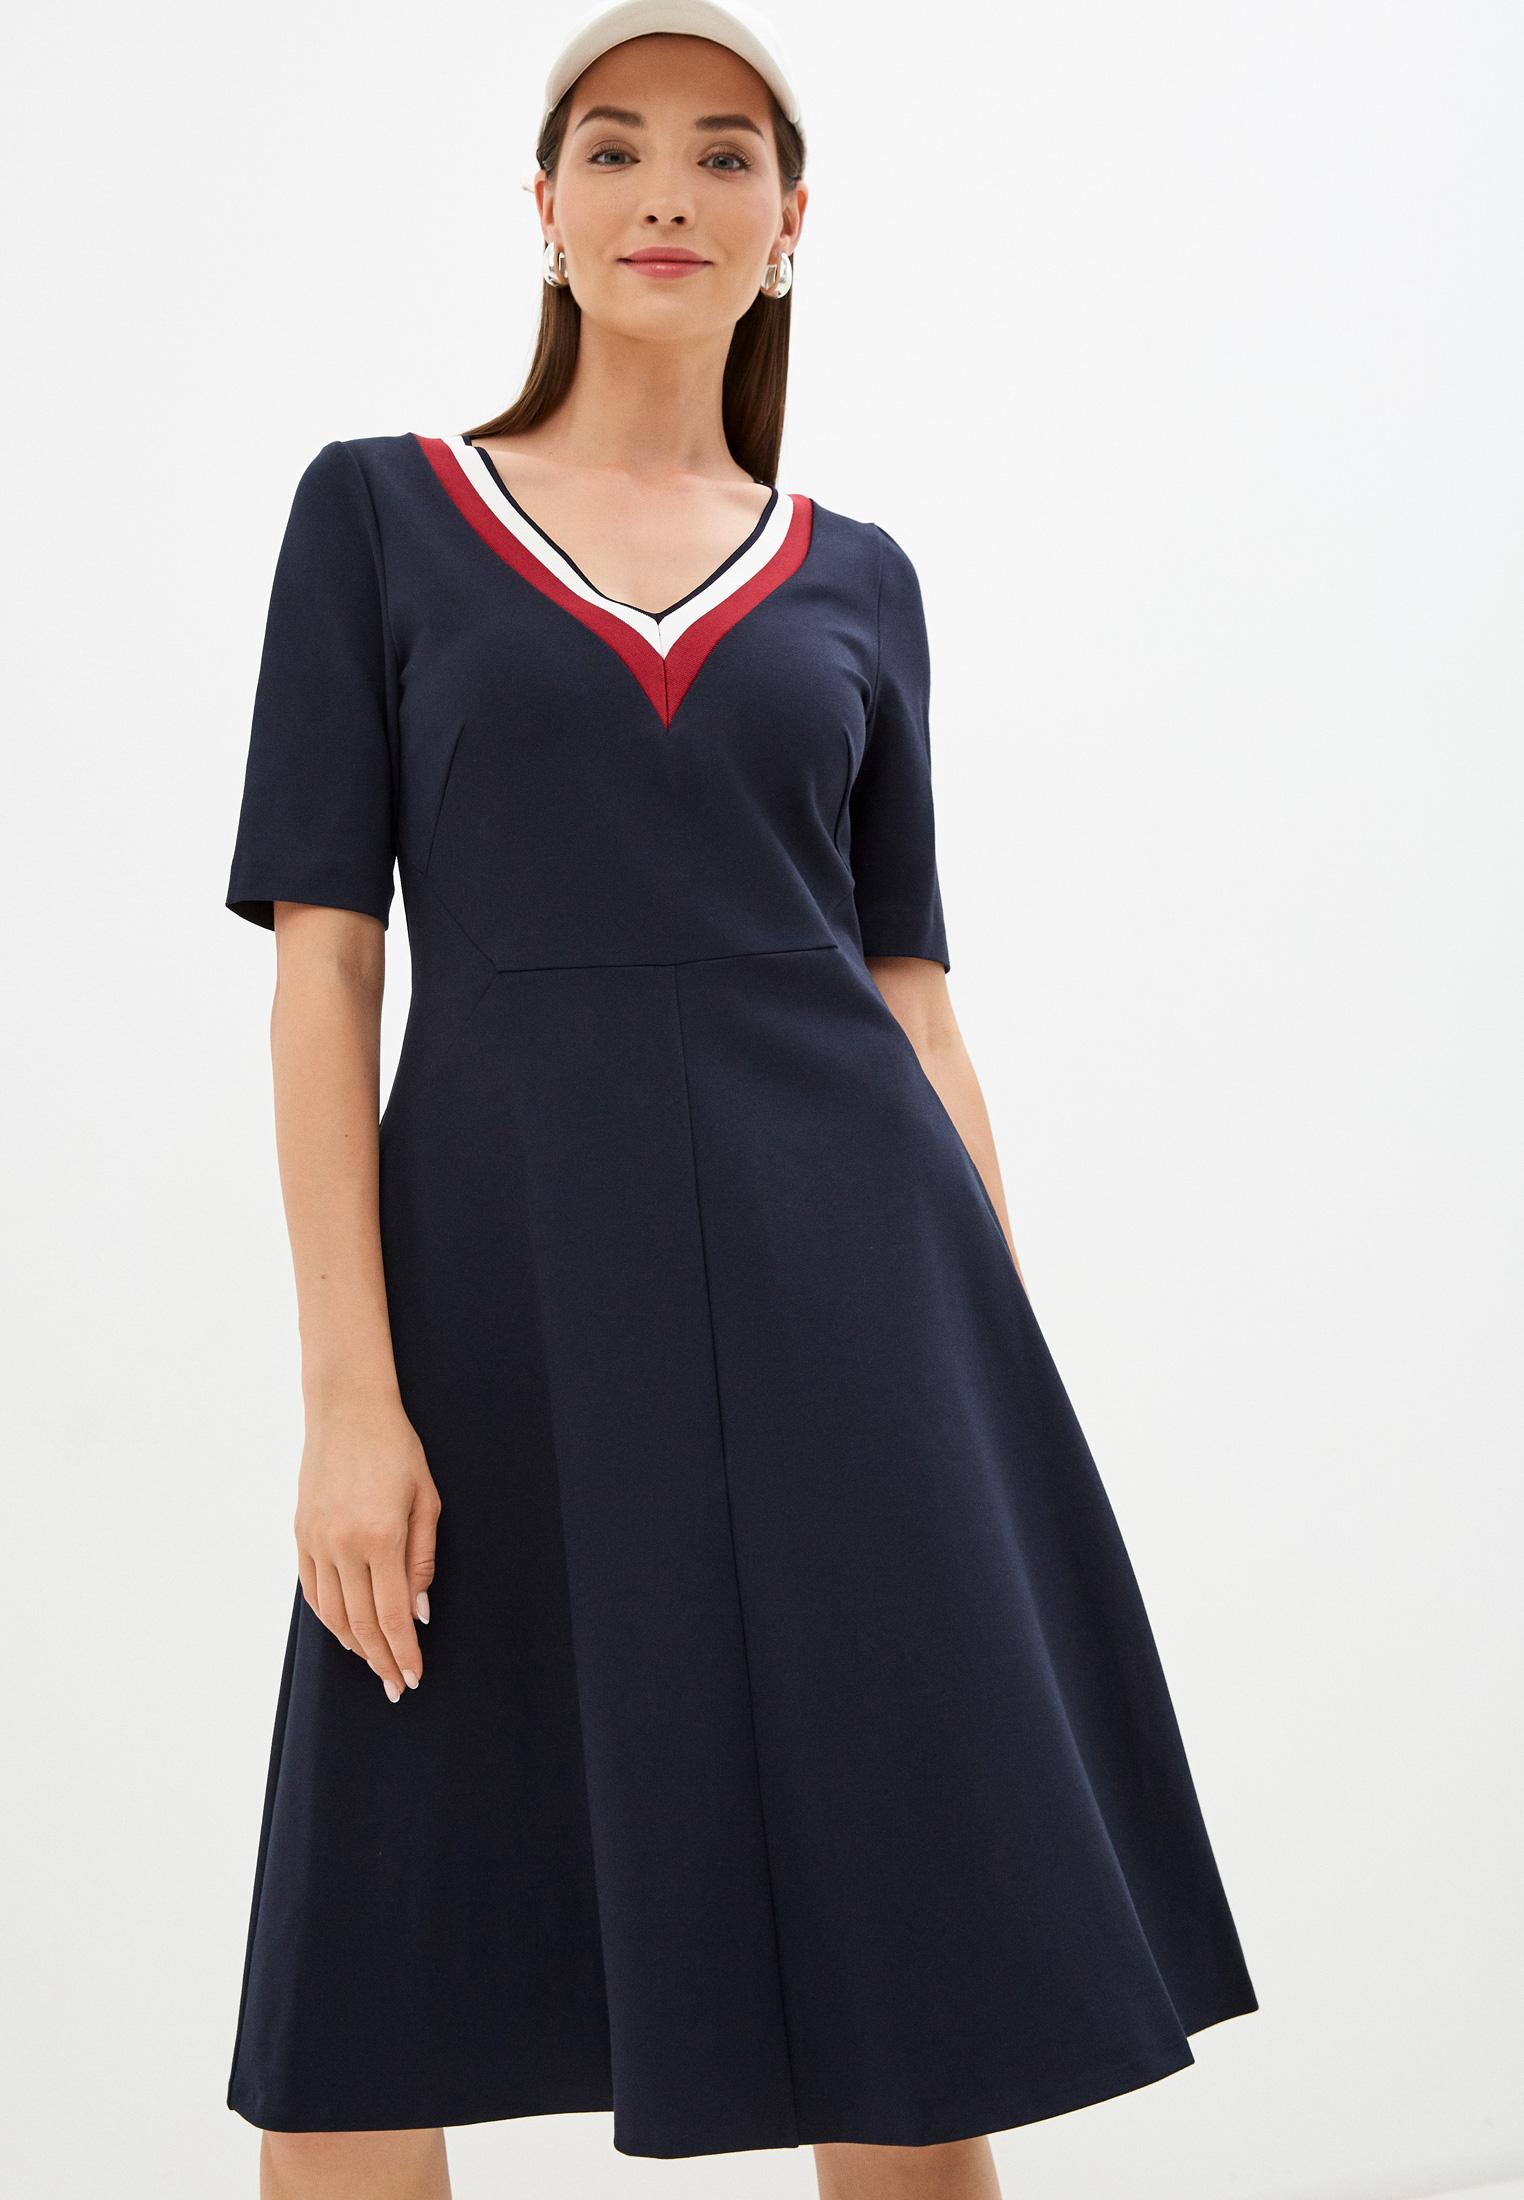 Платье Tommy Hilfiger (Томми Хилфигер) WW0WW29953